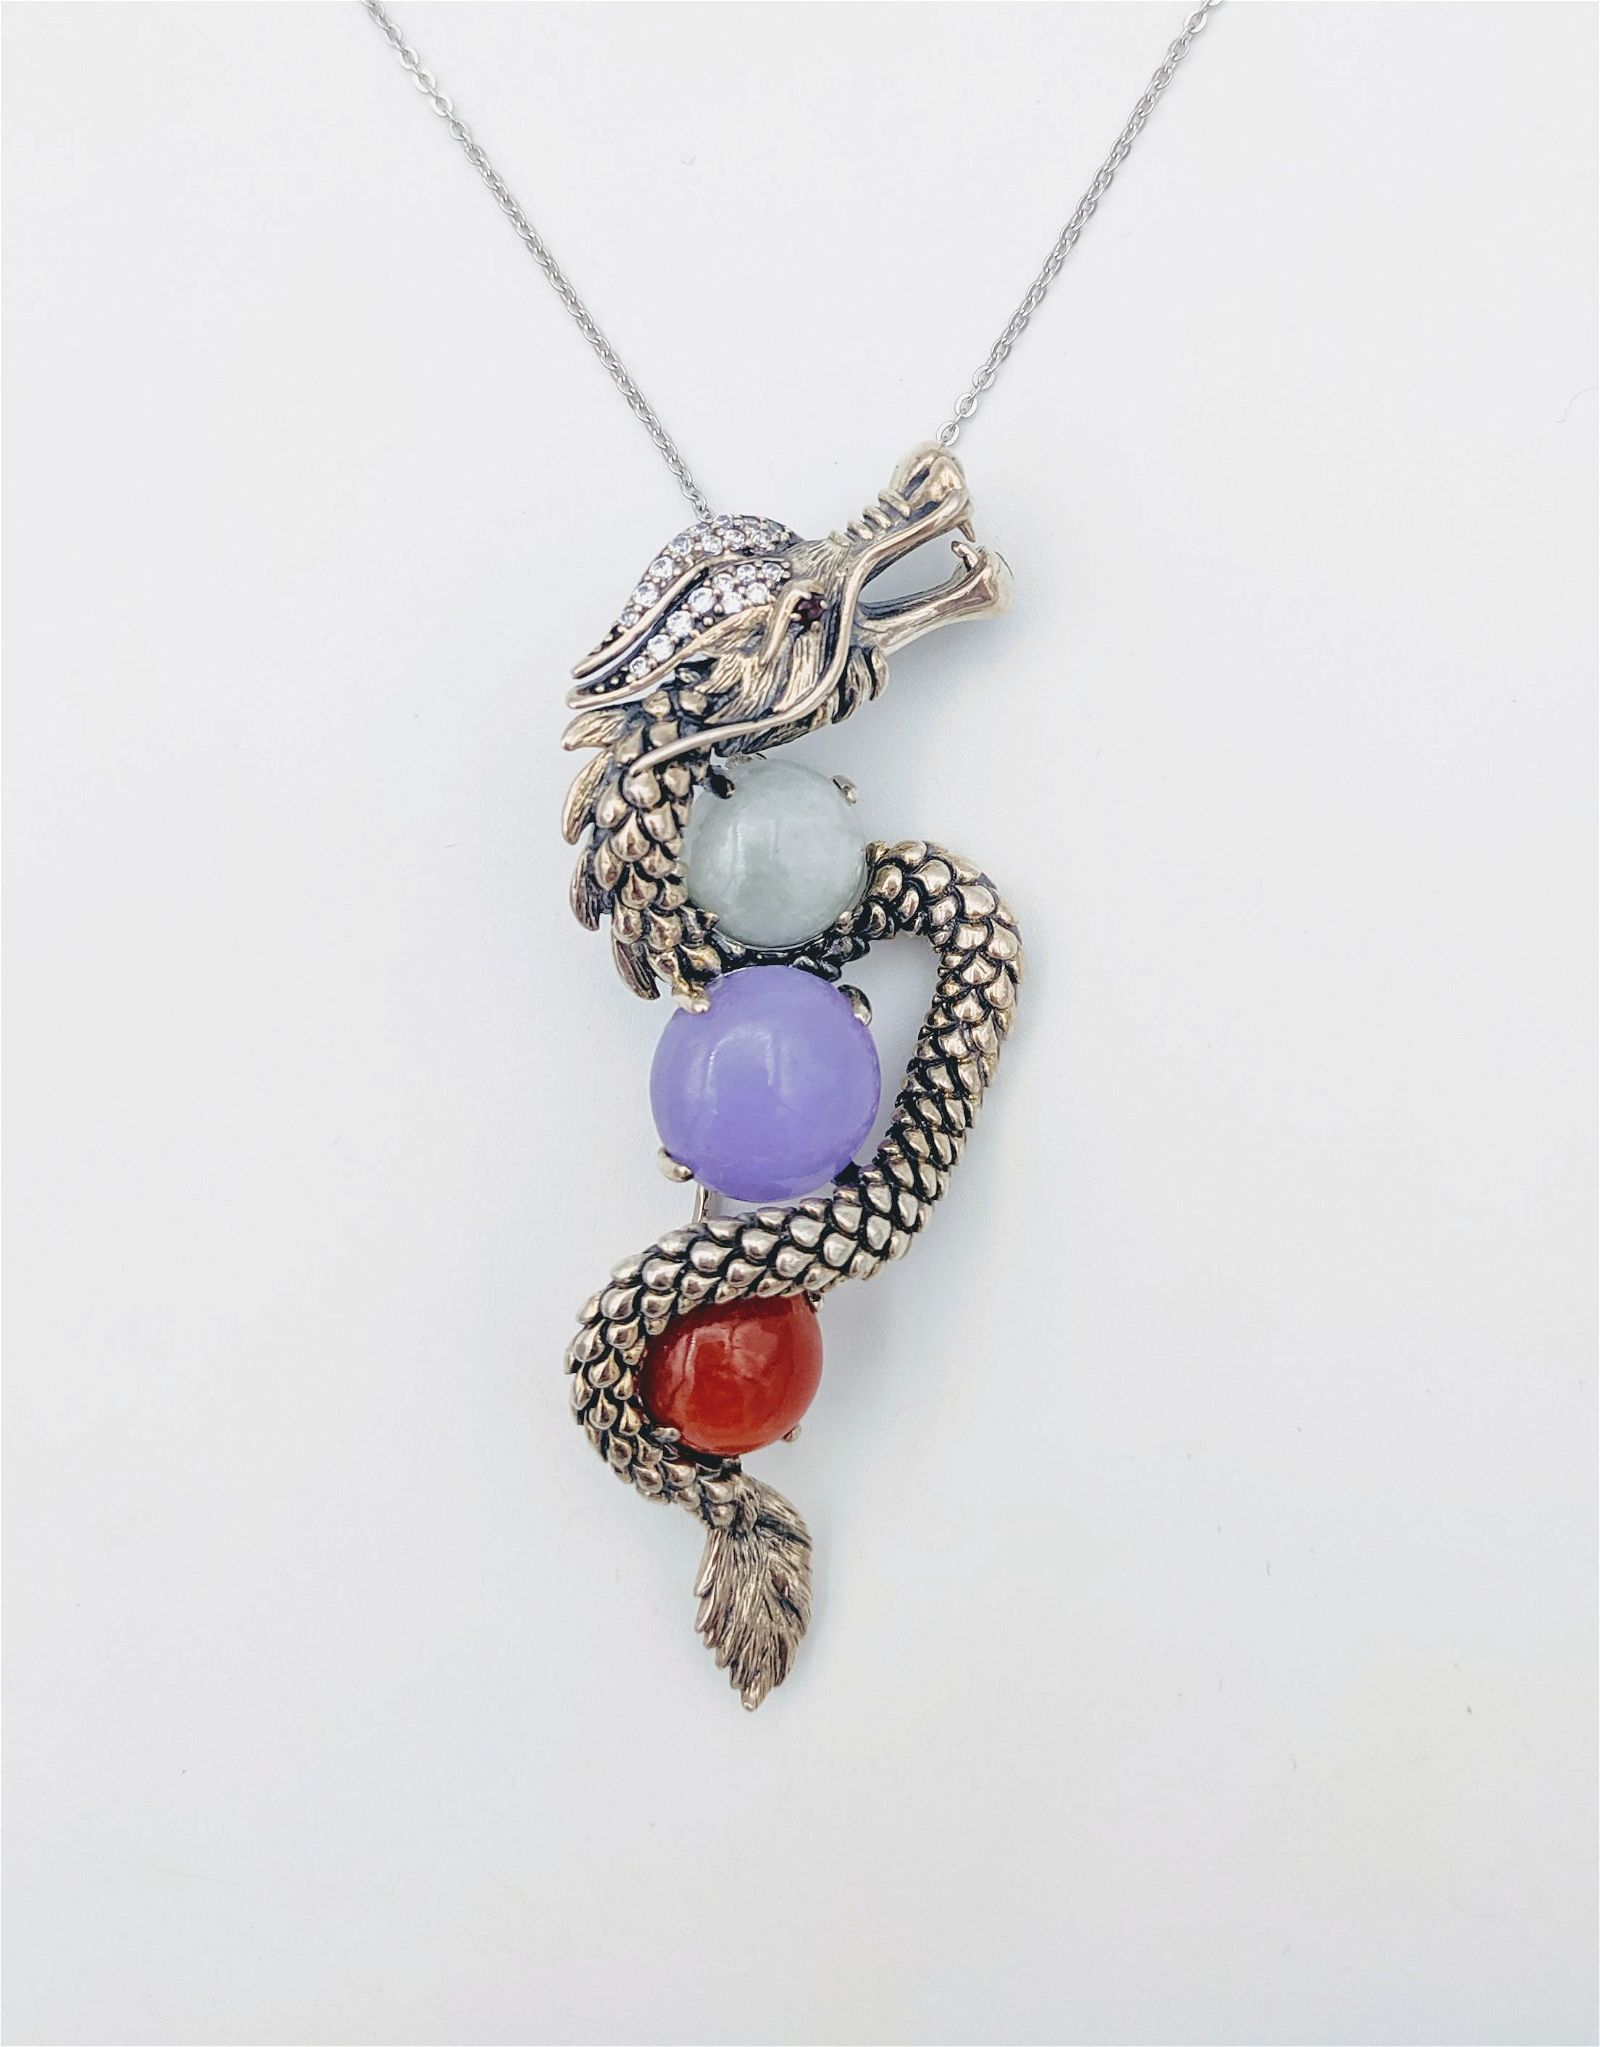 Sterling Silver Necklace w Dragon Brooch-Pendant w